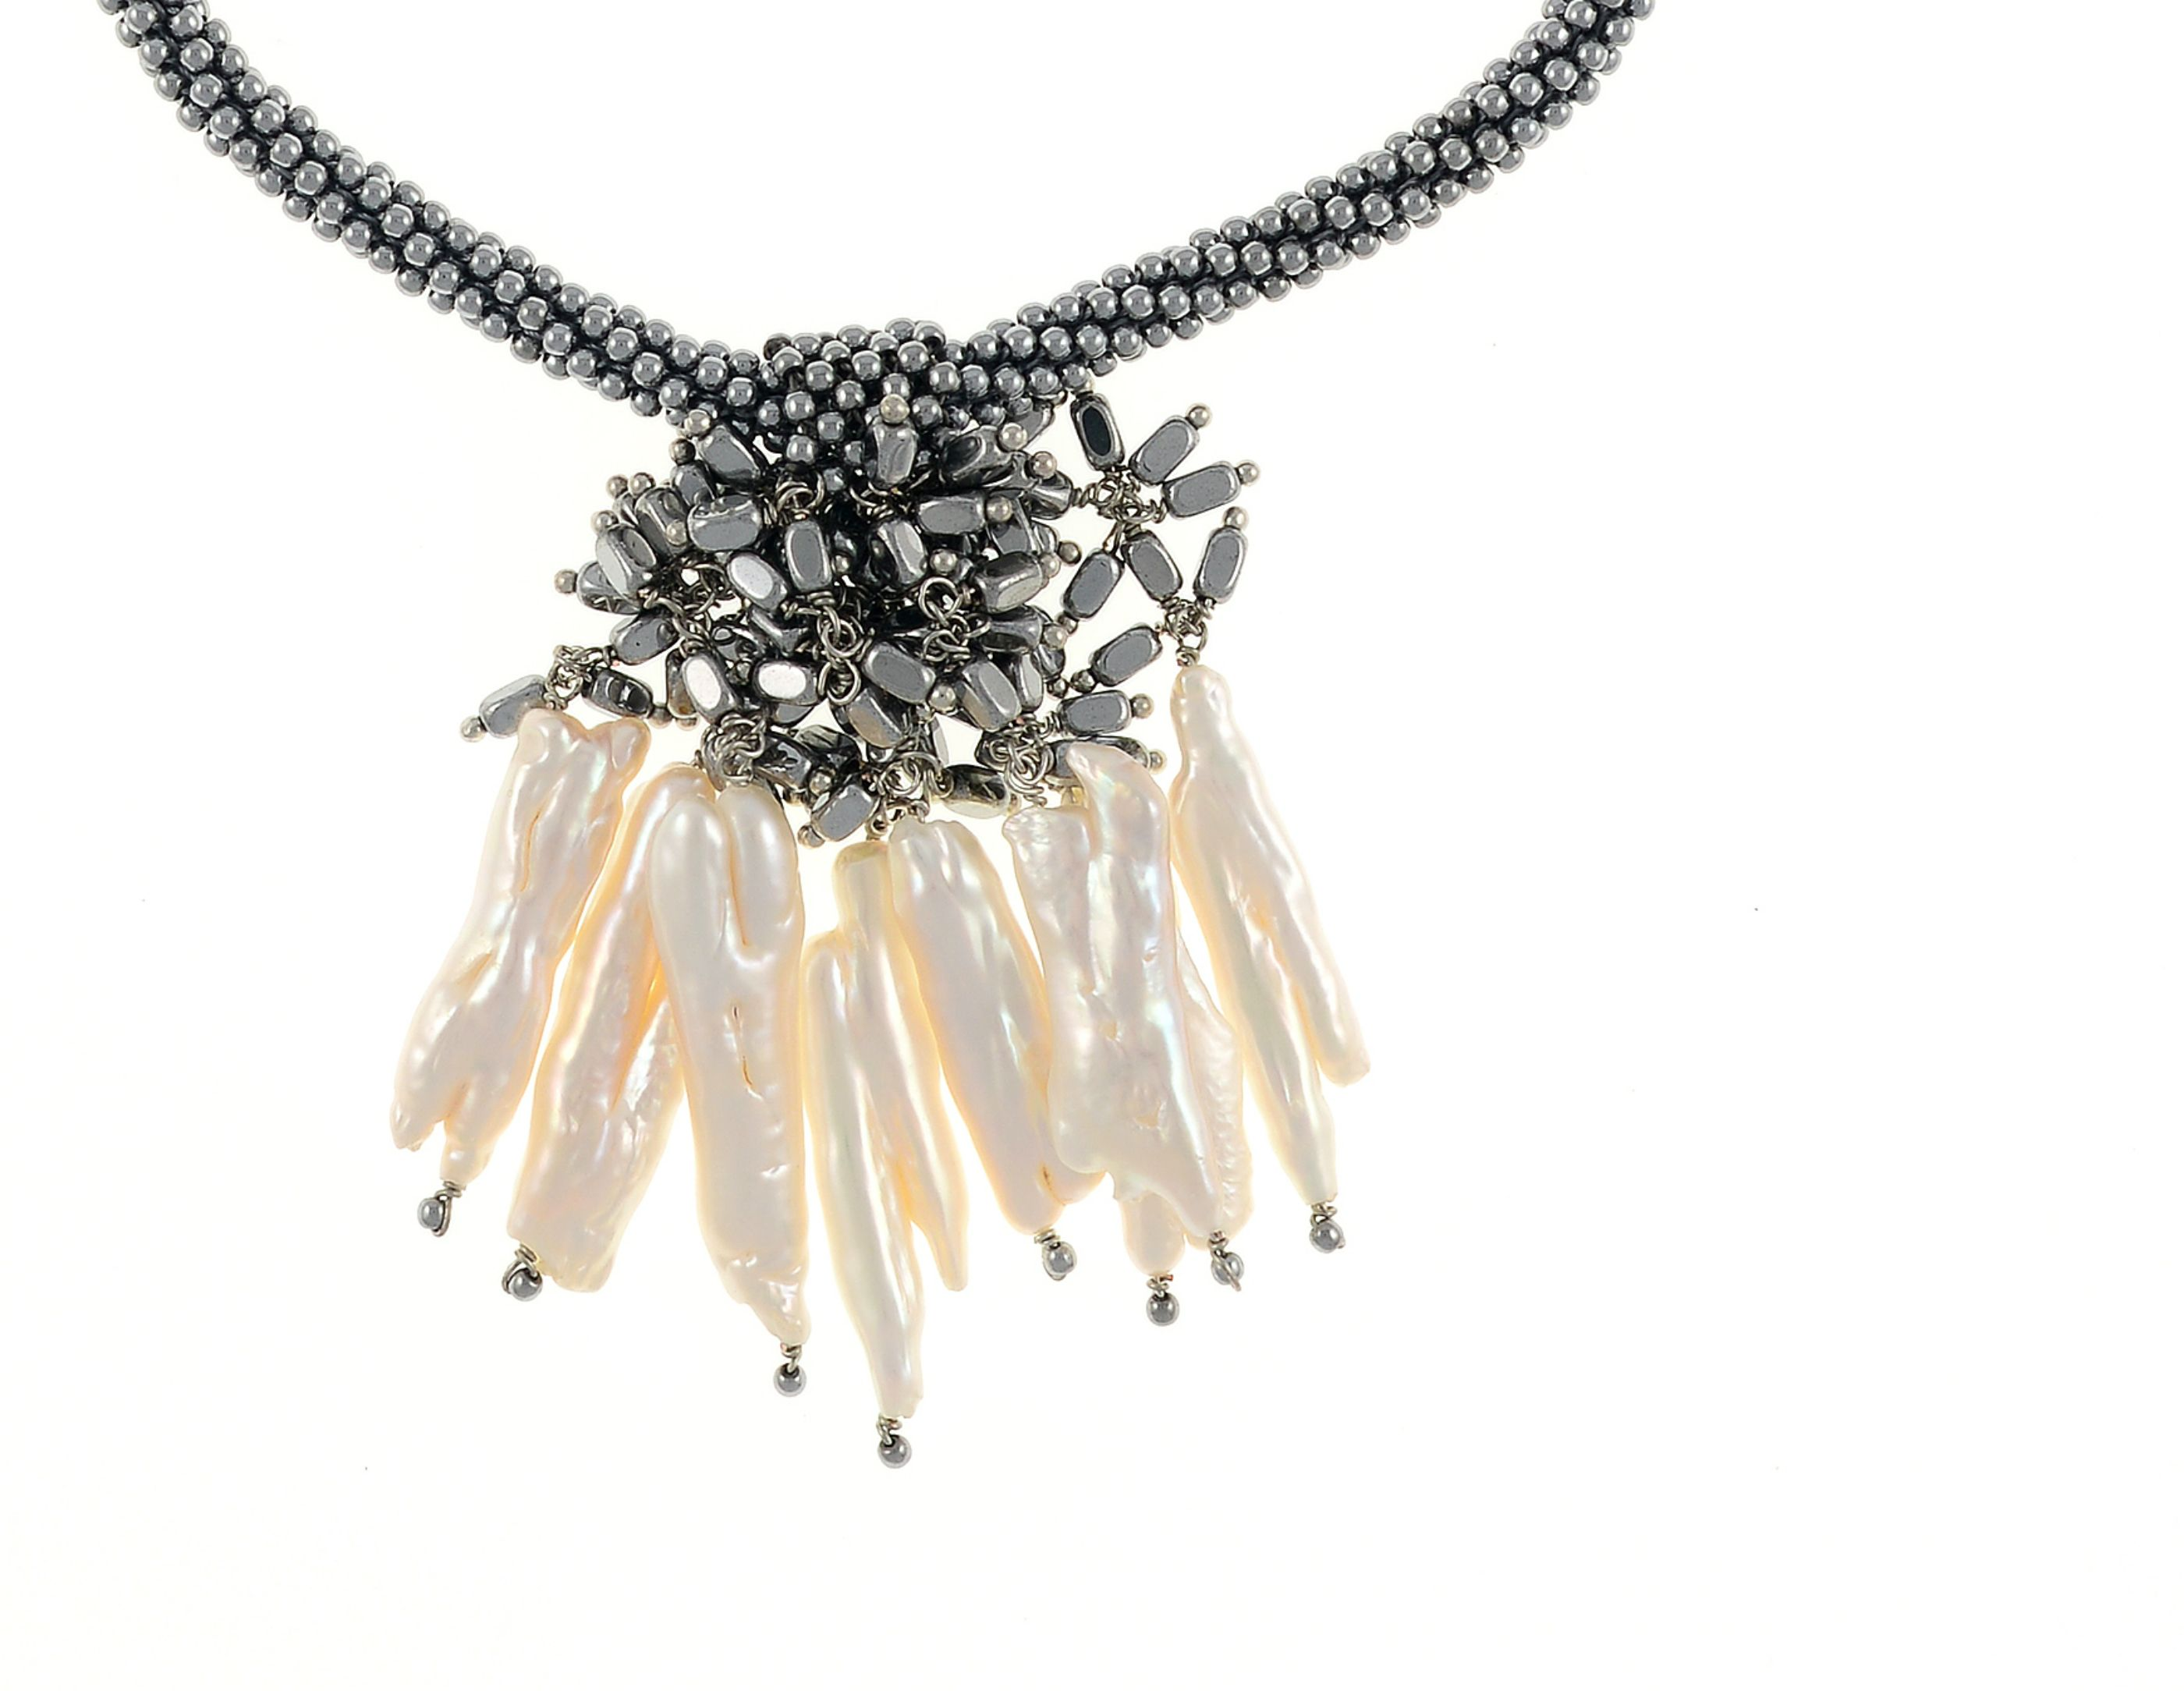 9037e231cb6 The Luray Treasury*- White Tooth Pearl & Woven Hematite Necklace ...